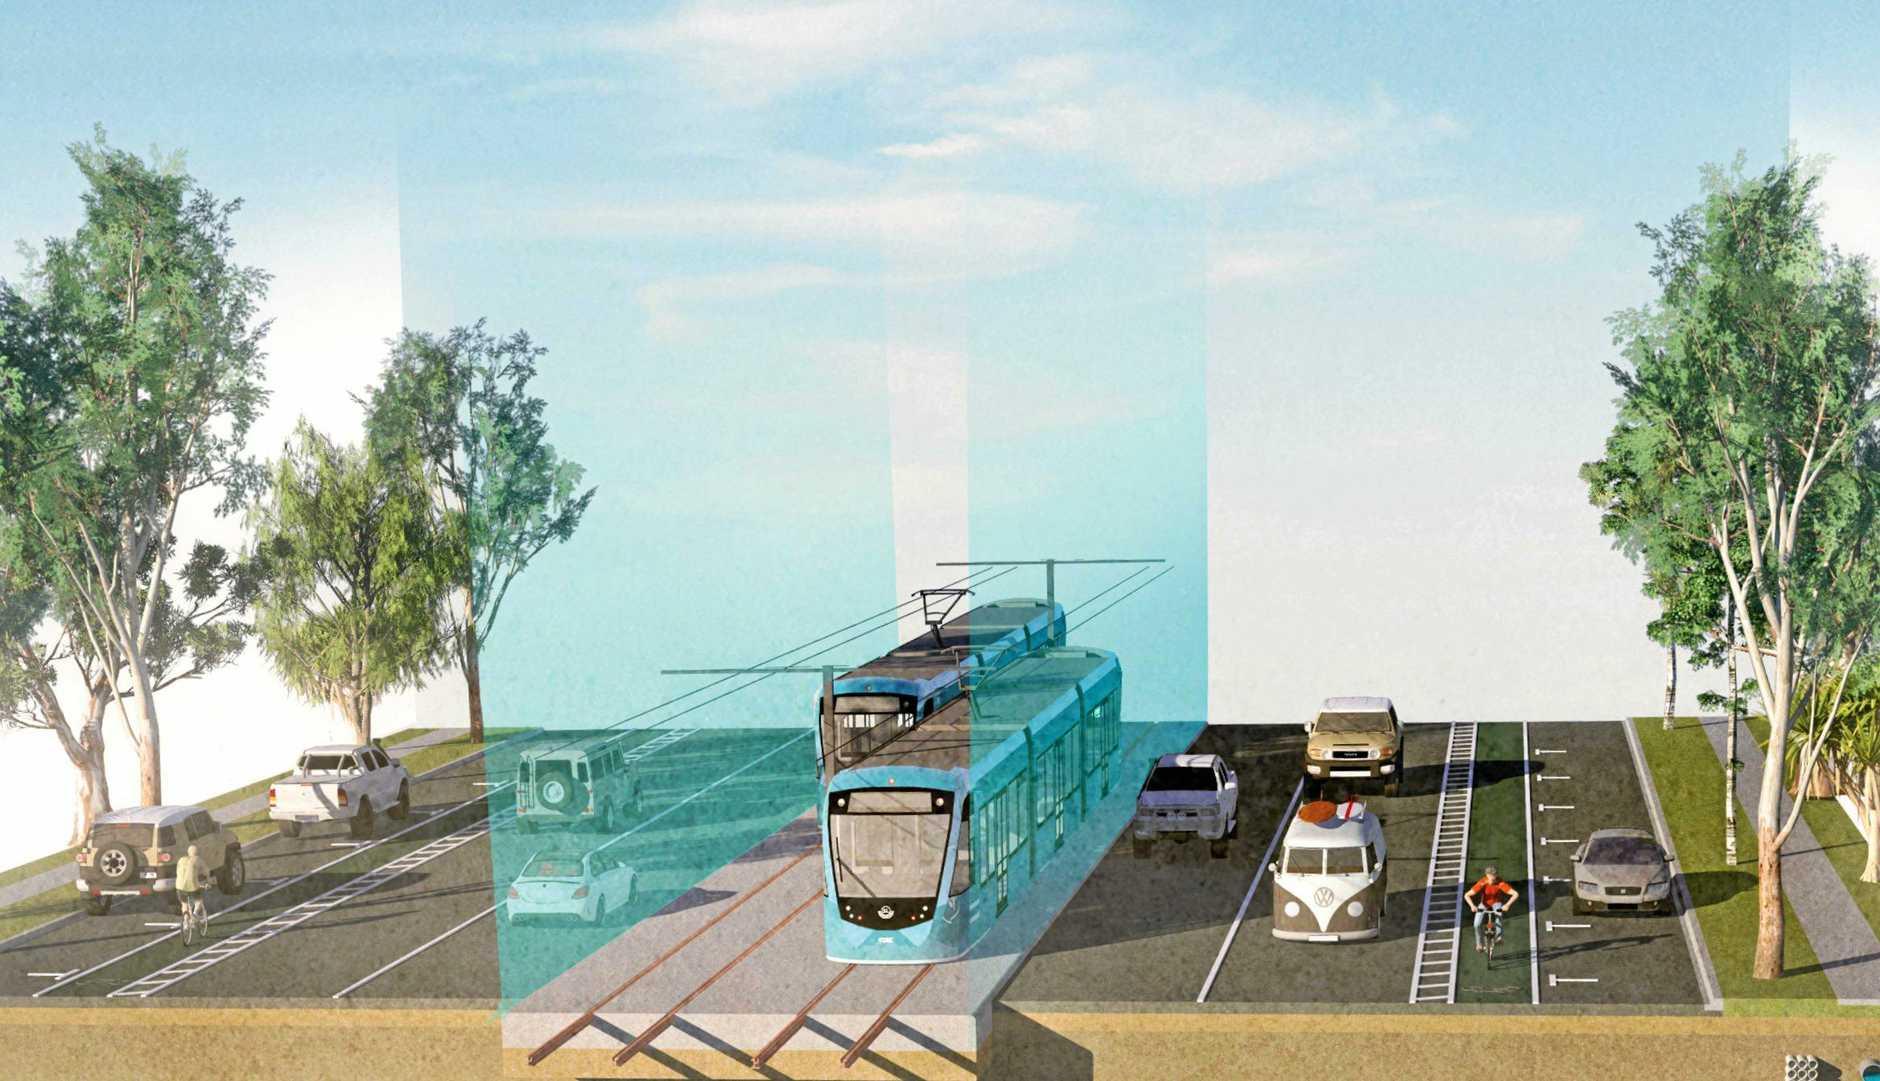 Council endorses Strategic Business Case for Sunshine Coast mass transit system.